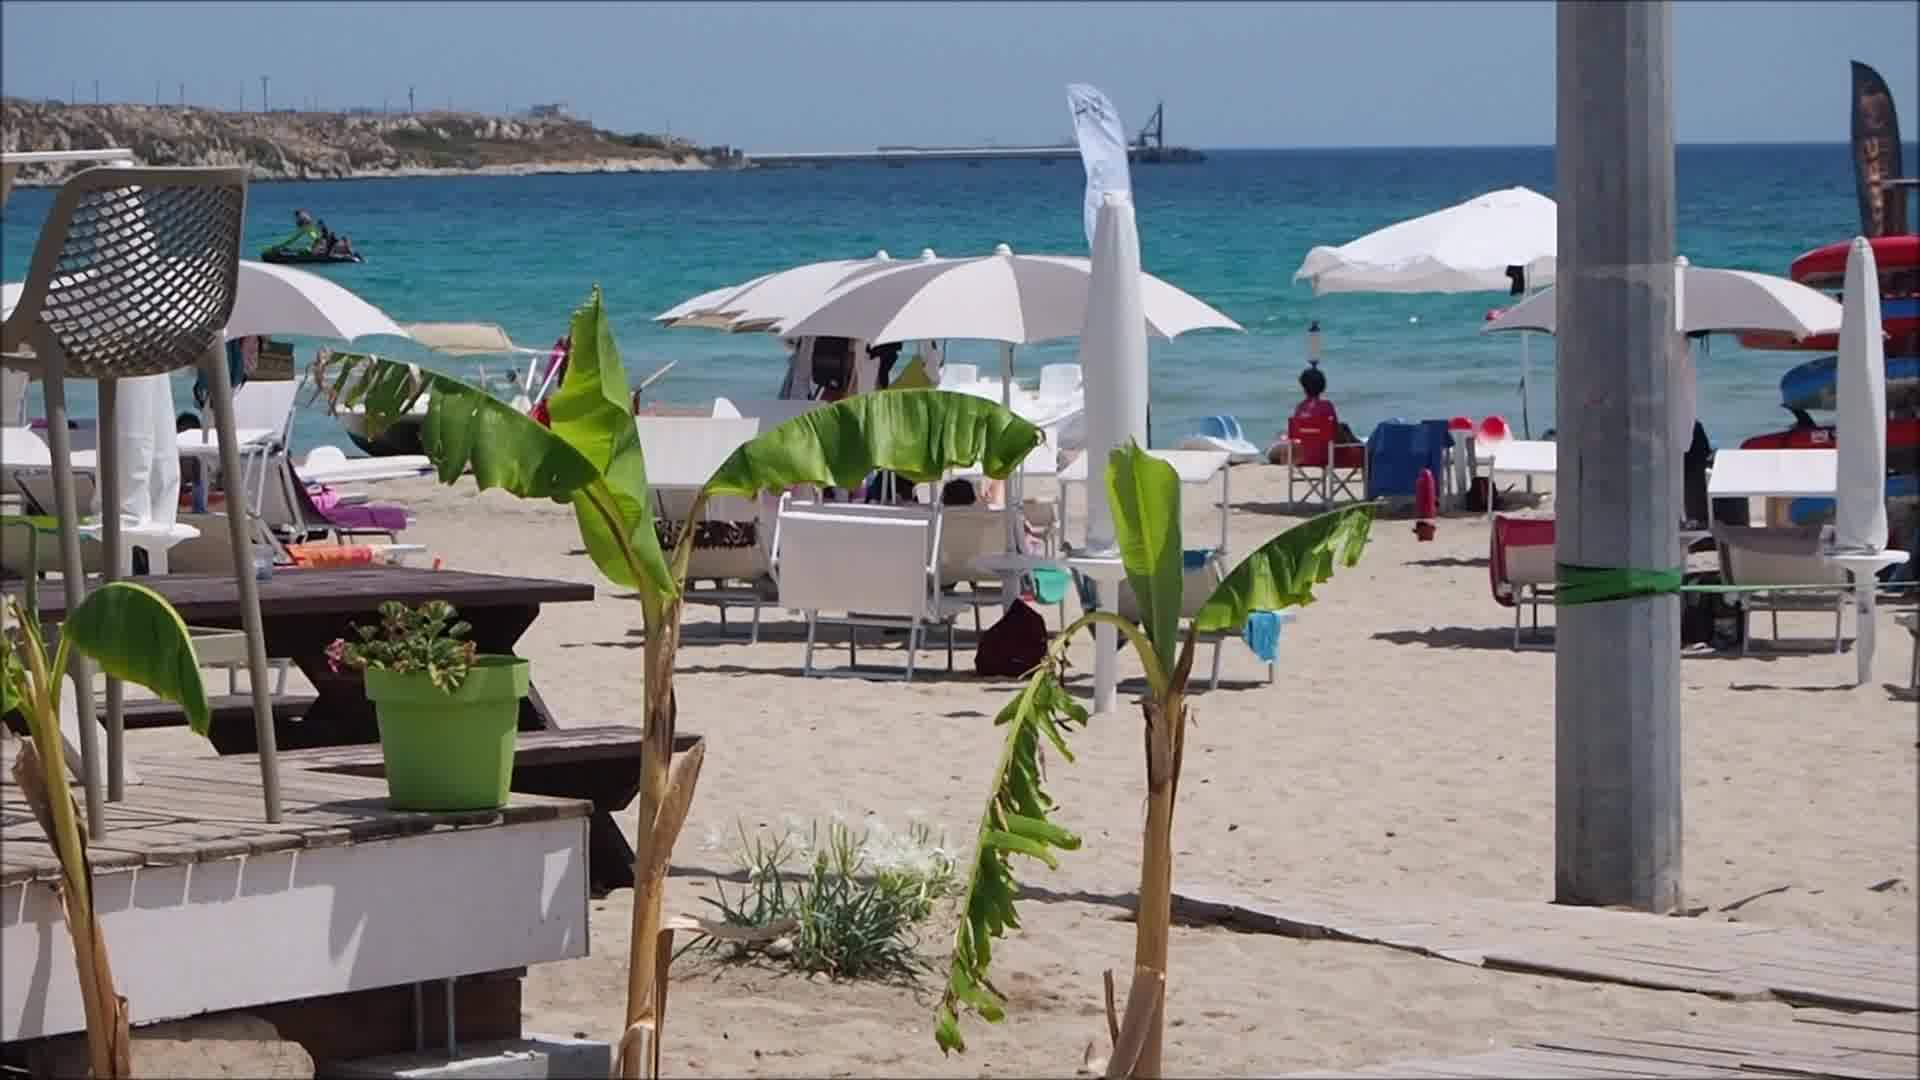 B64 Beach & Restaurant